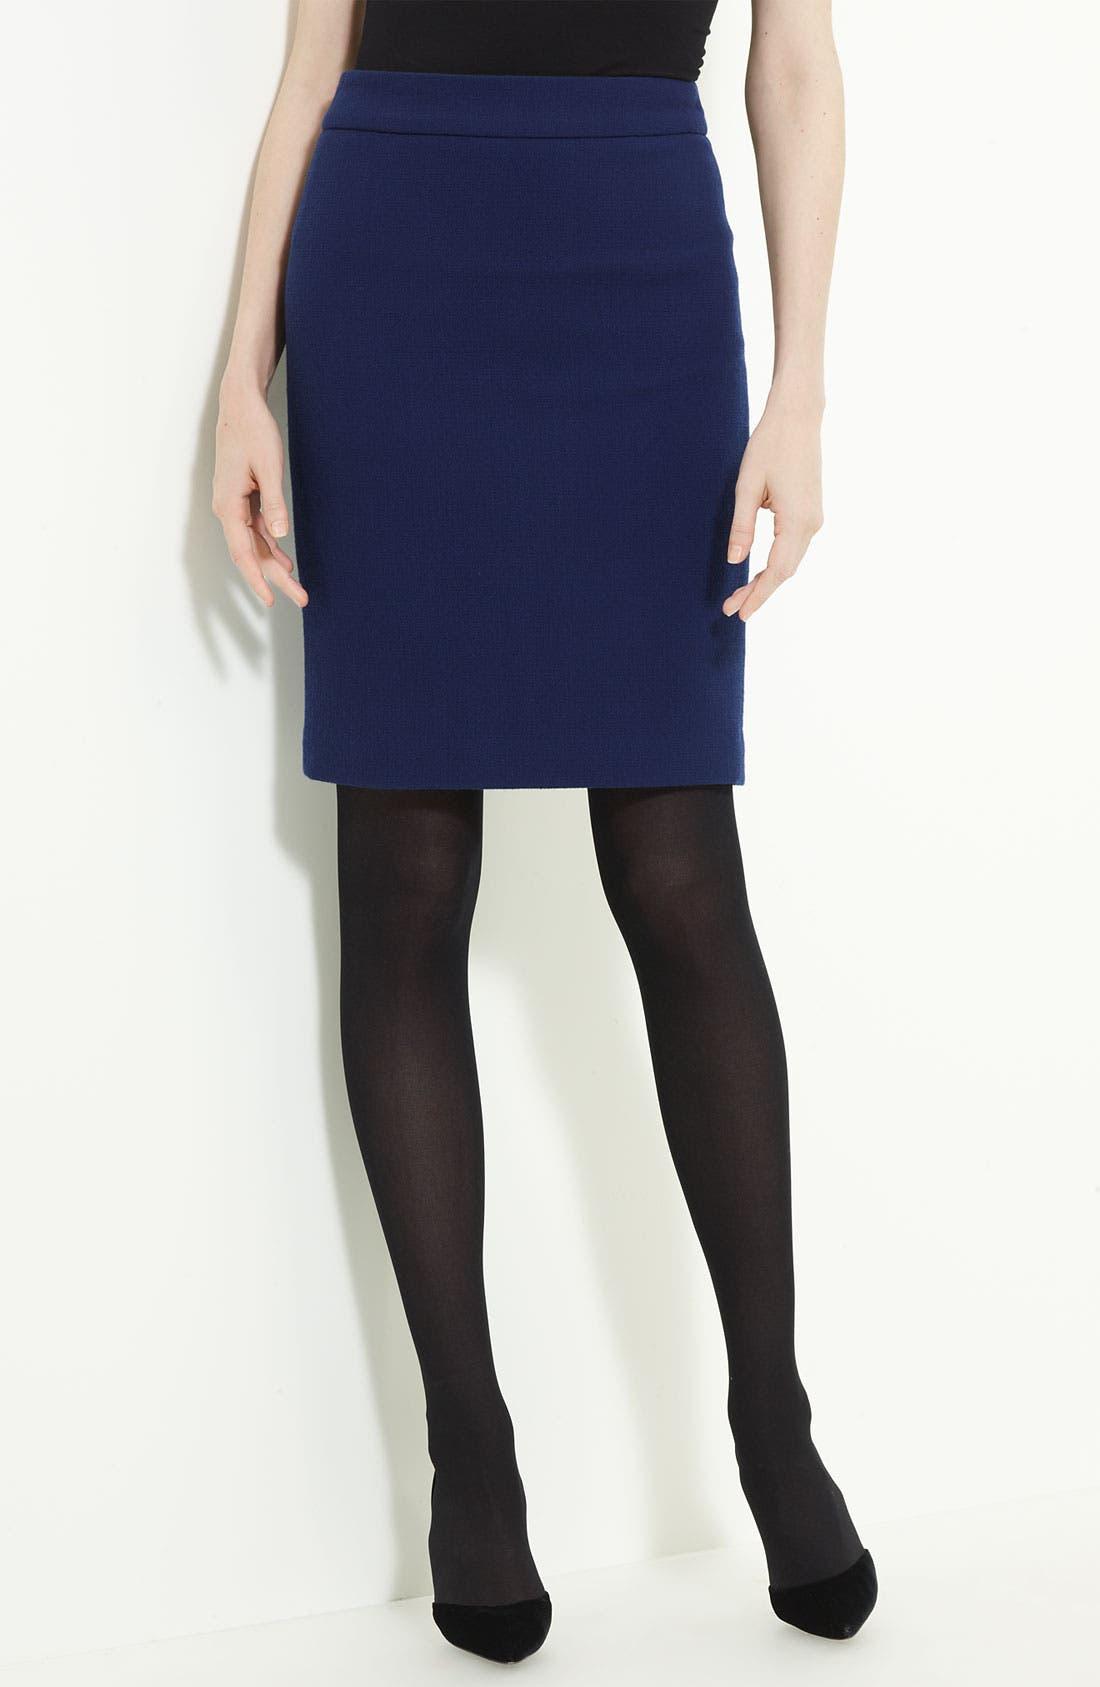 Alternate Image 1 Selected - Armani Collezioni Crepe Skirt